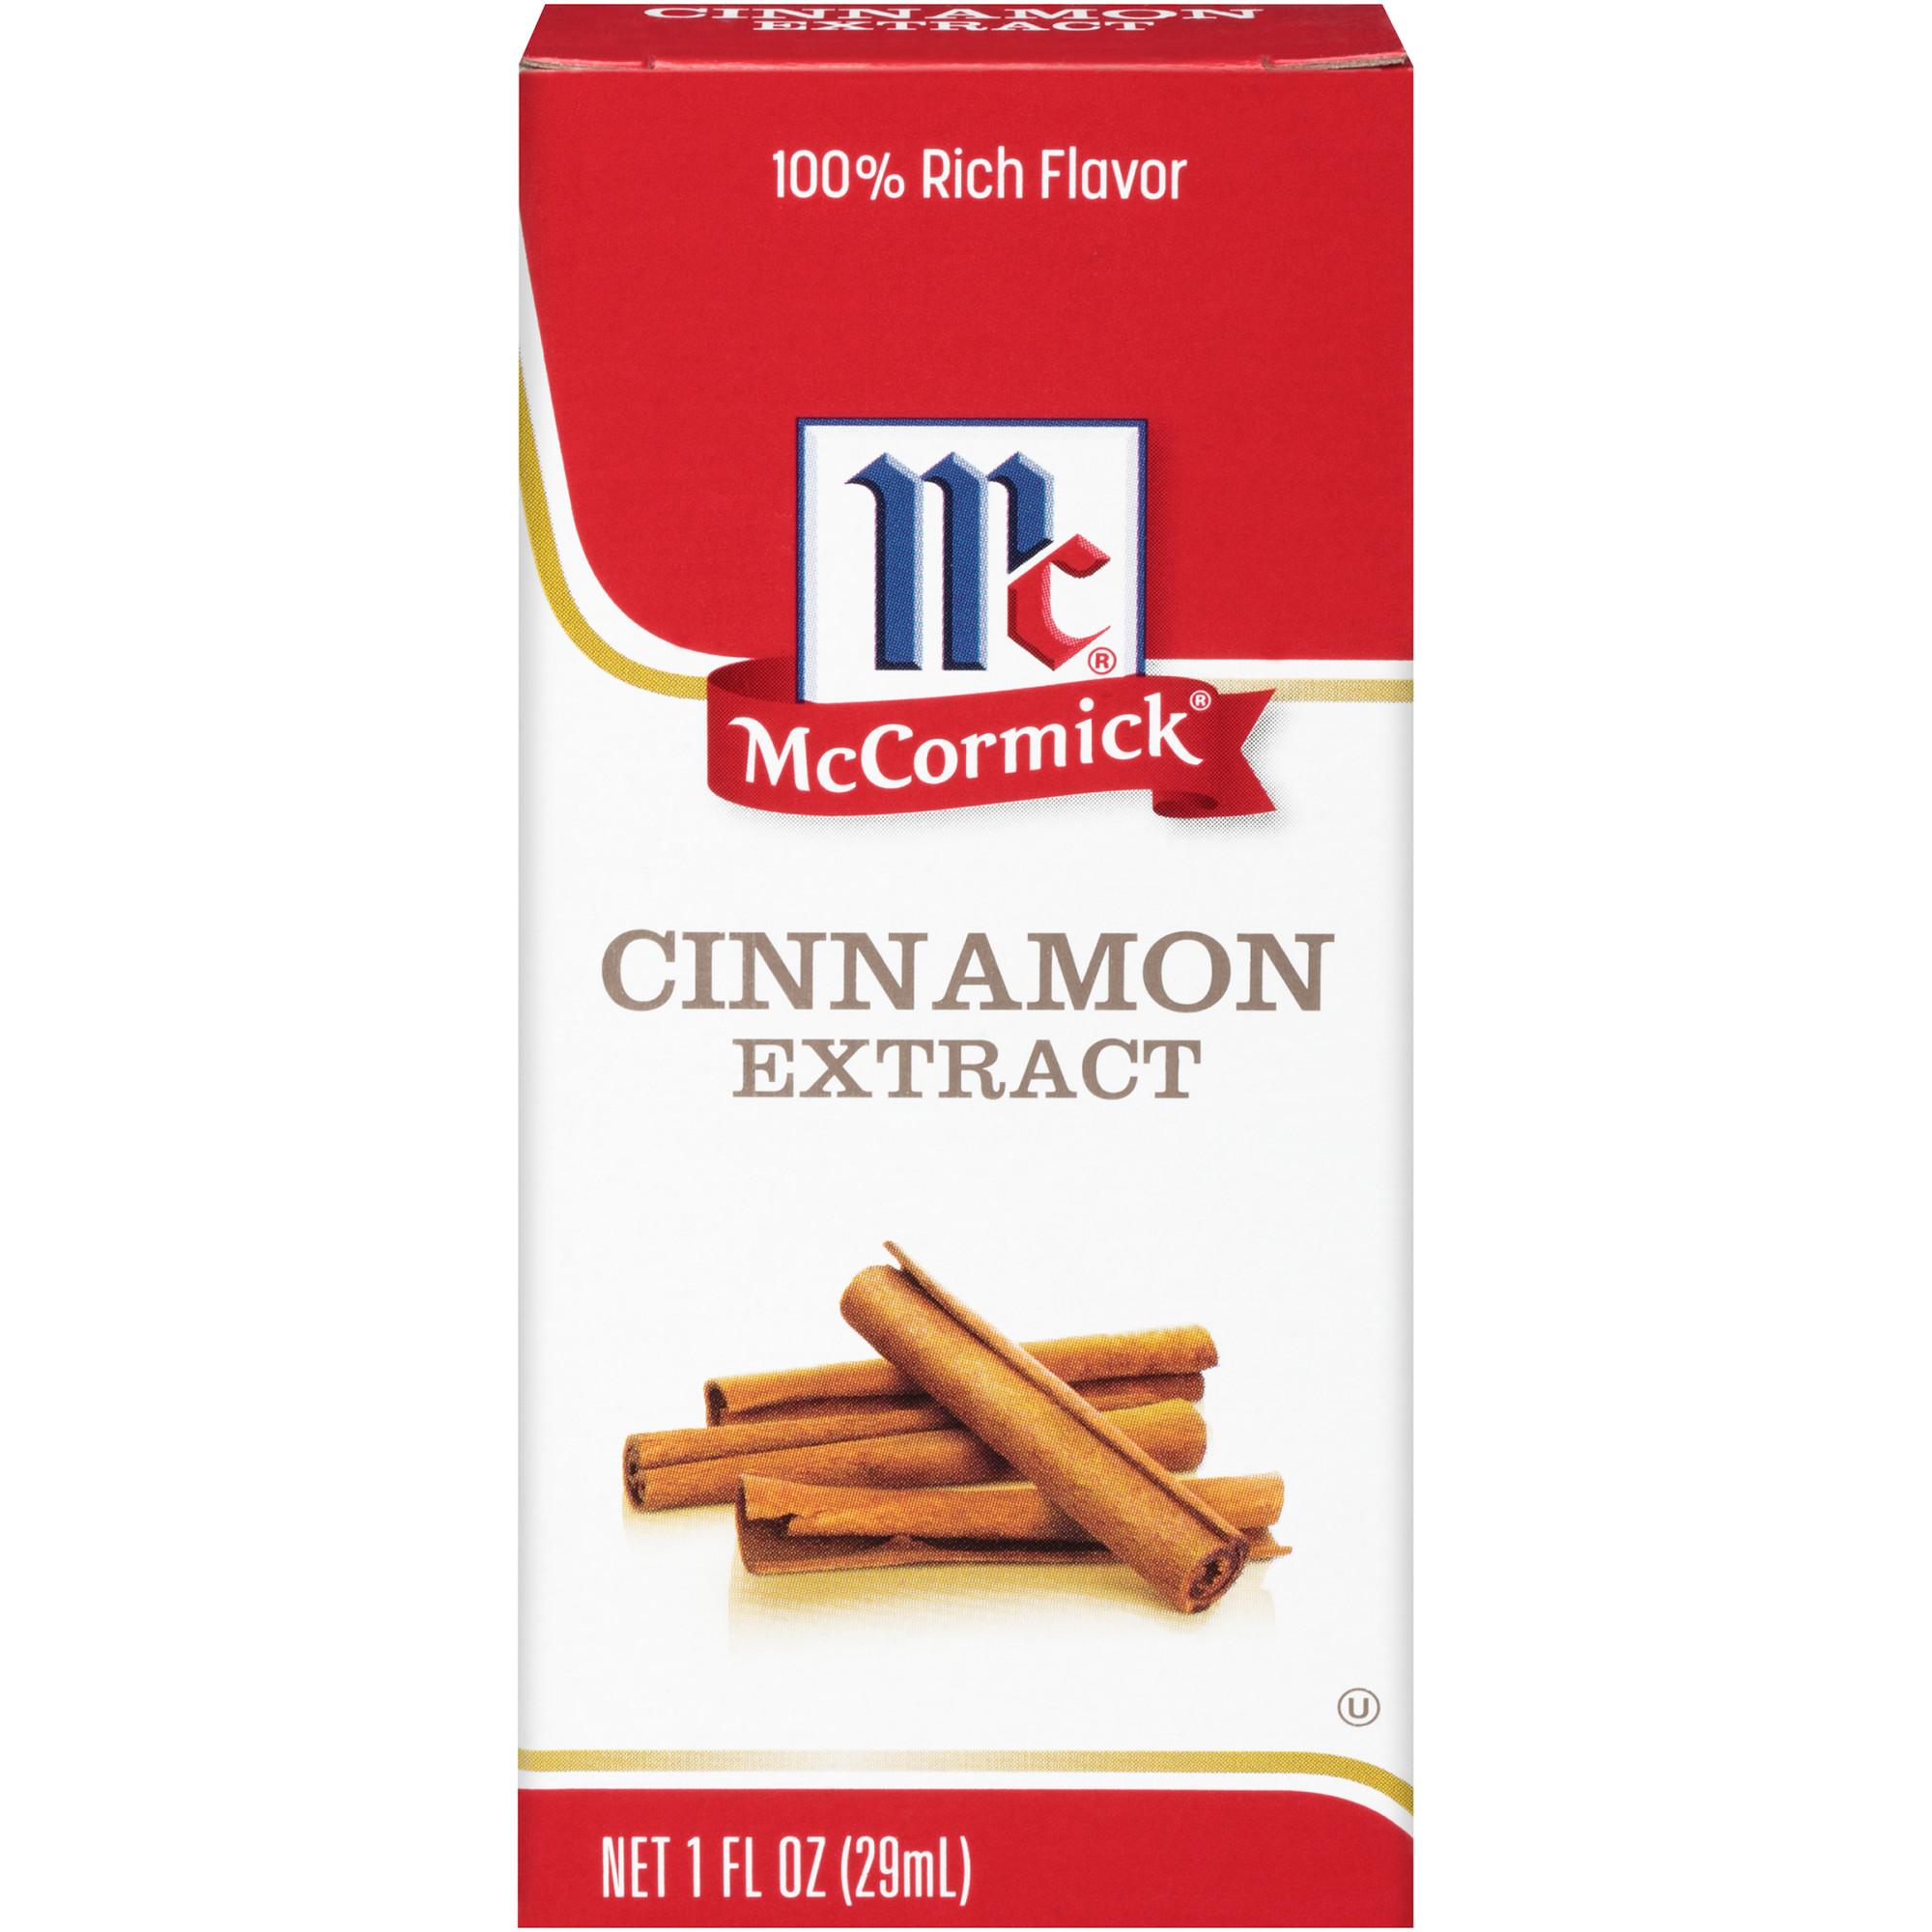 McCormick Cinnamon Extract, 1 fl oz